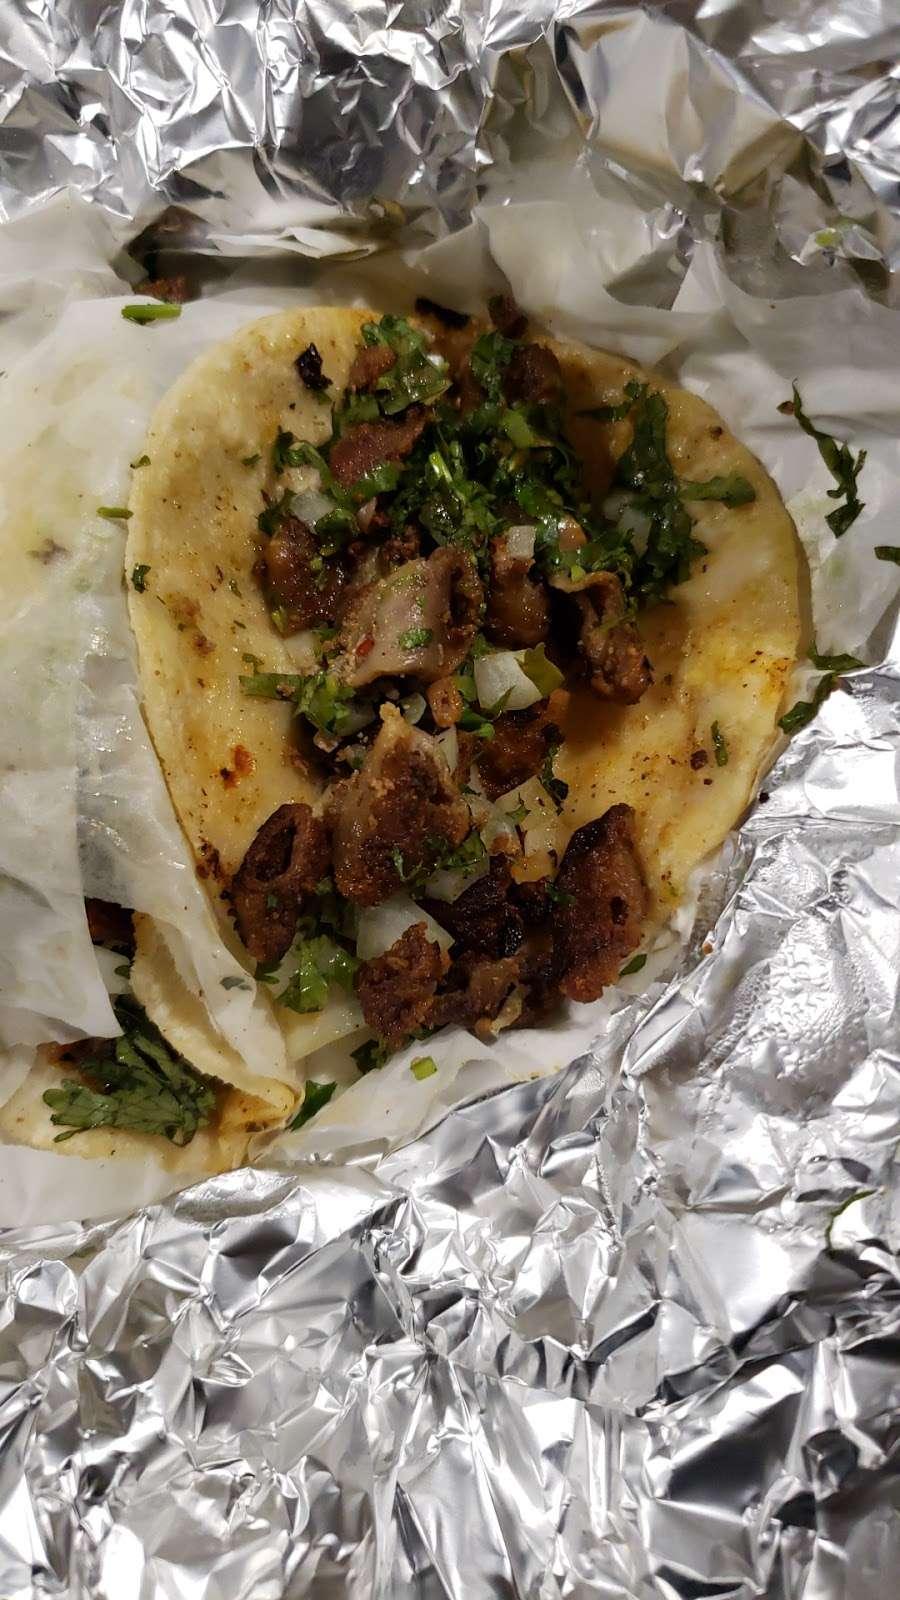 Taqueria Jamay Jalisco - restaurant  | Photo 2 of 5 | Address: 19200 Saums Rd, Houston, TX 77084, USA | Phone: (281) 578-5703